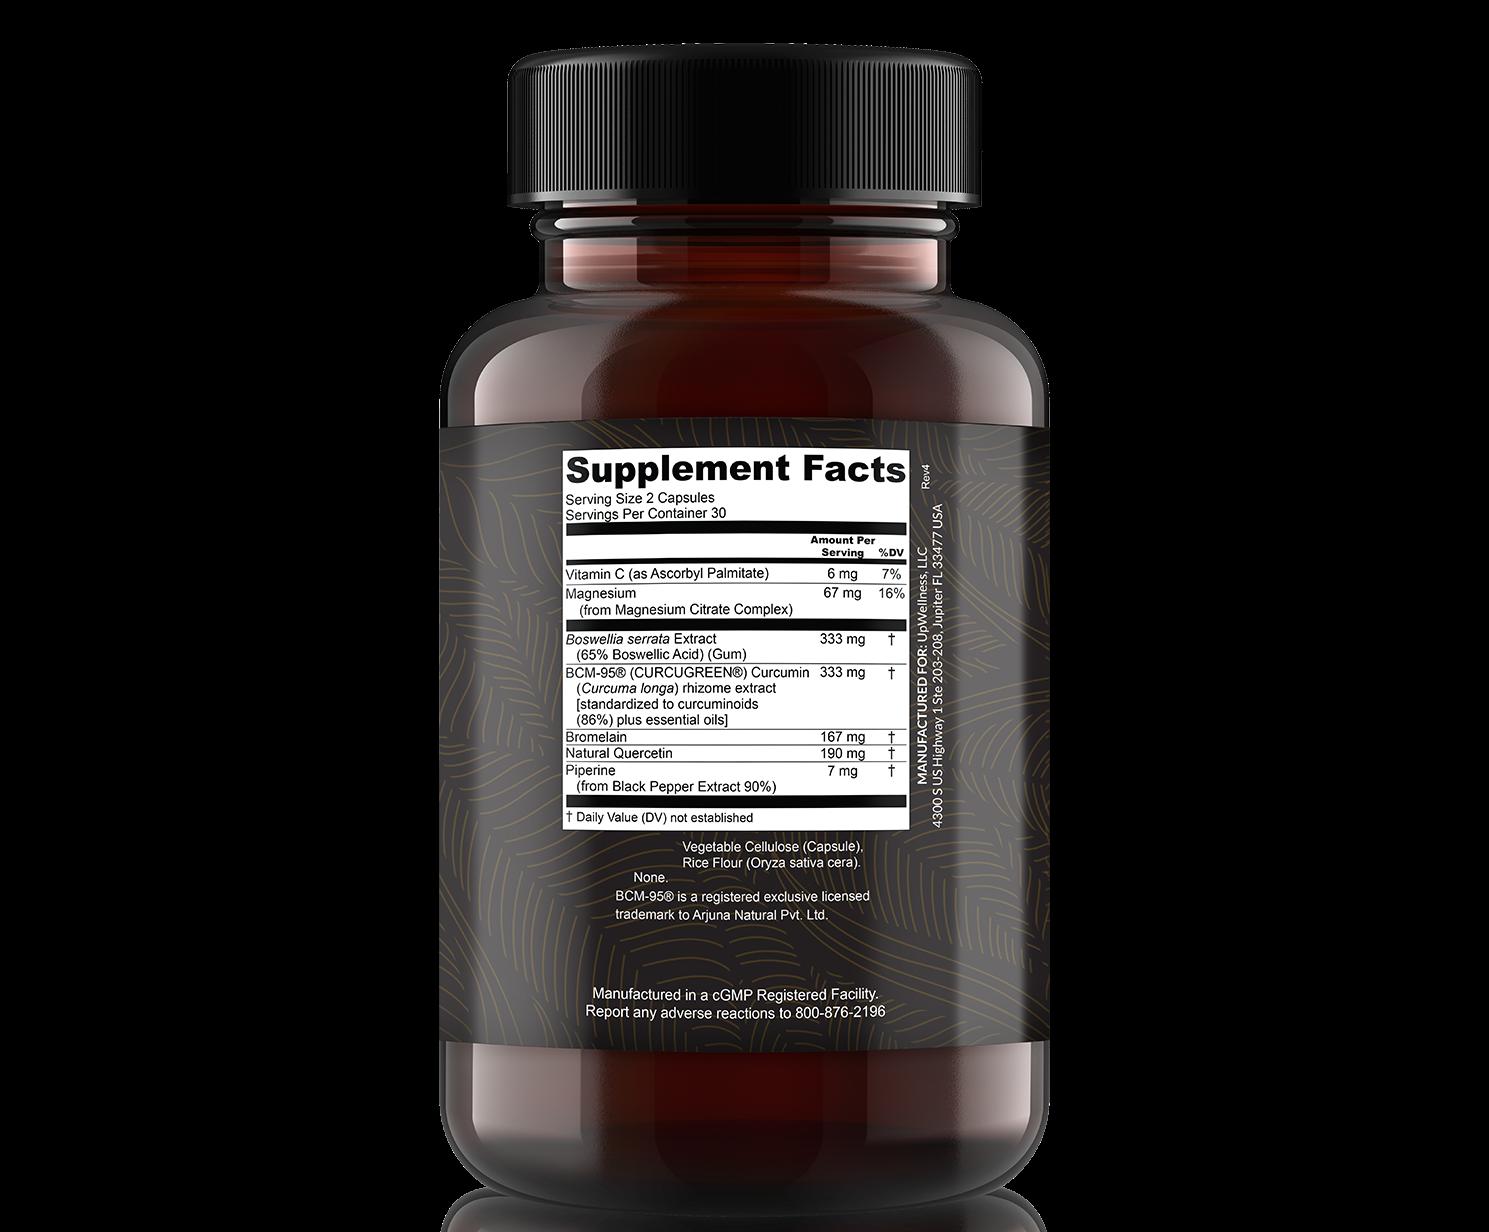 golden revive plus ingredients label